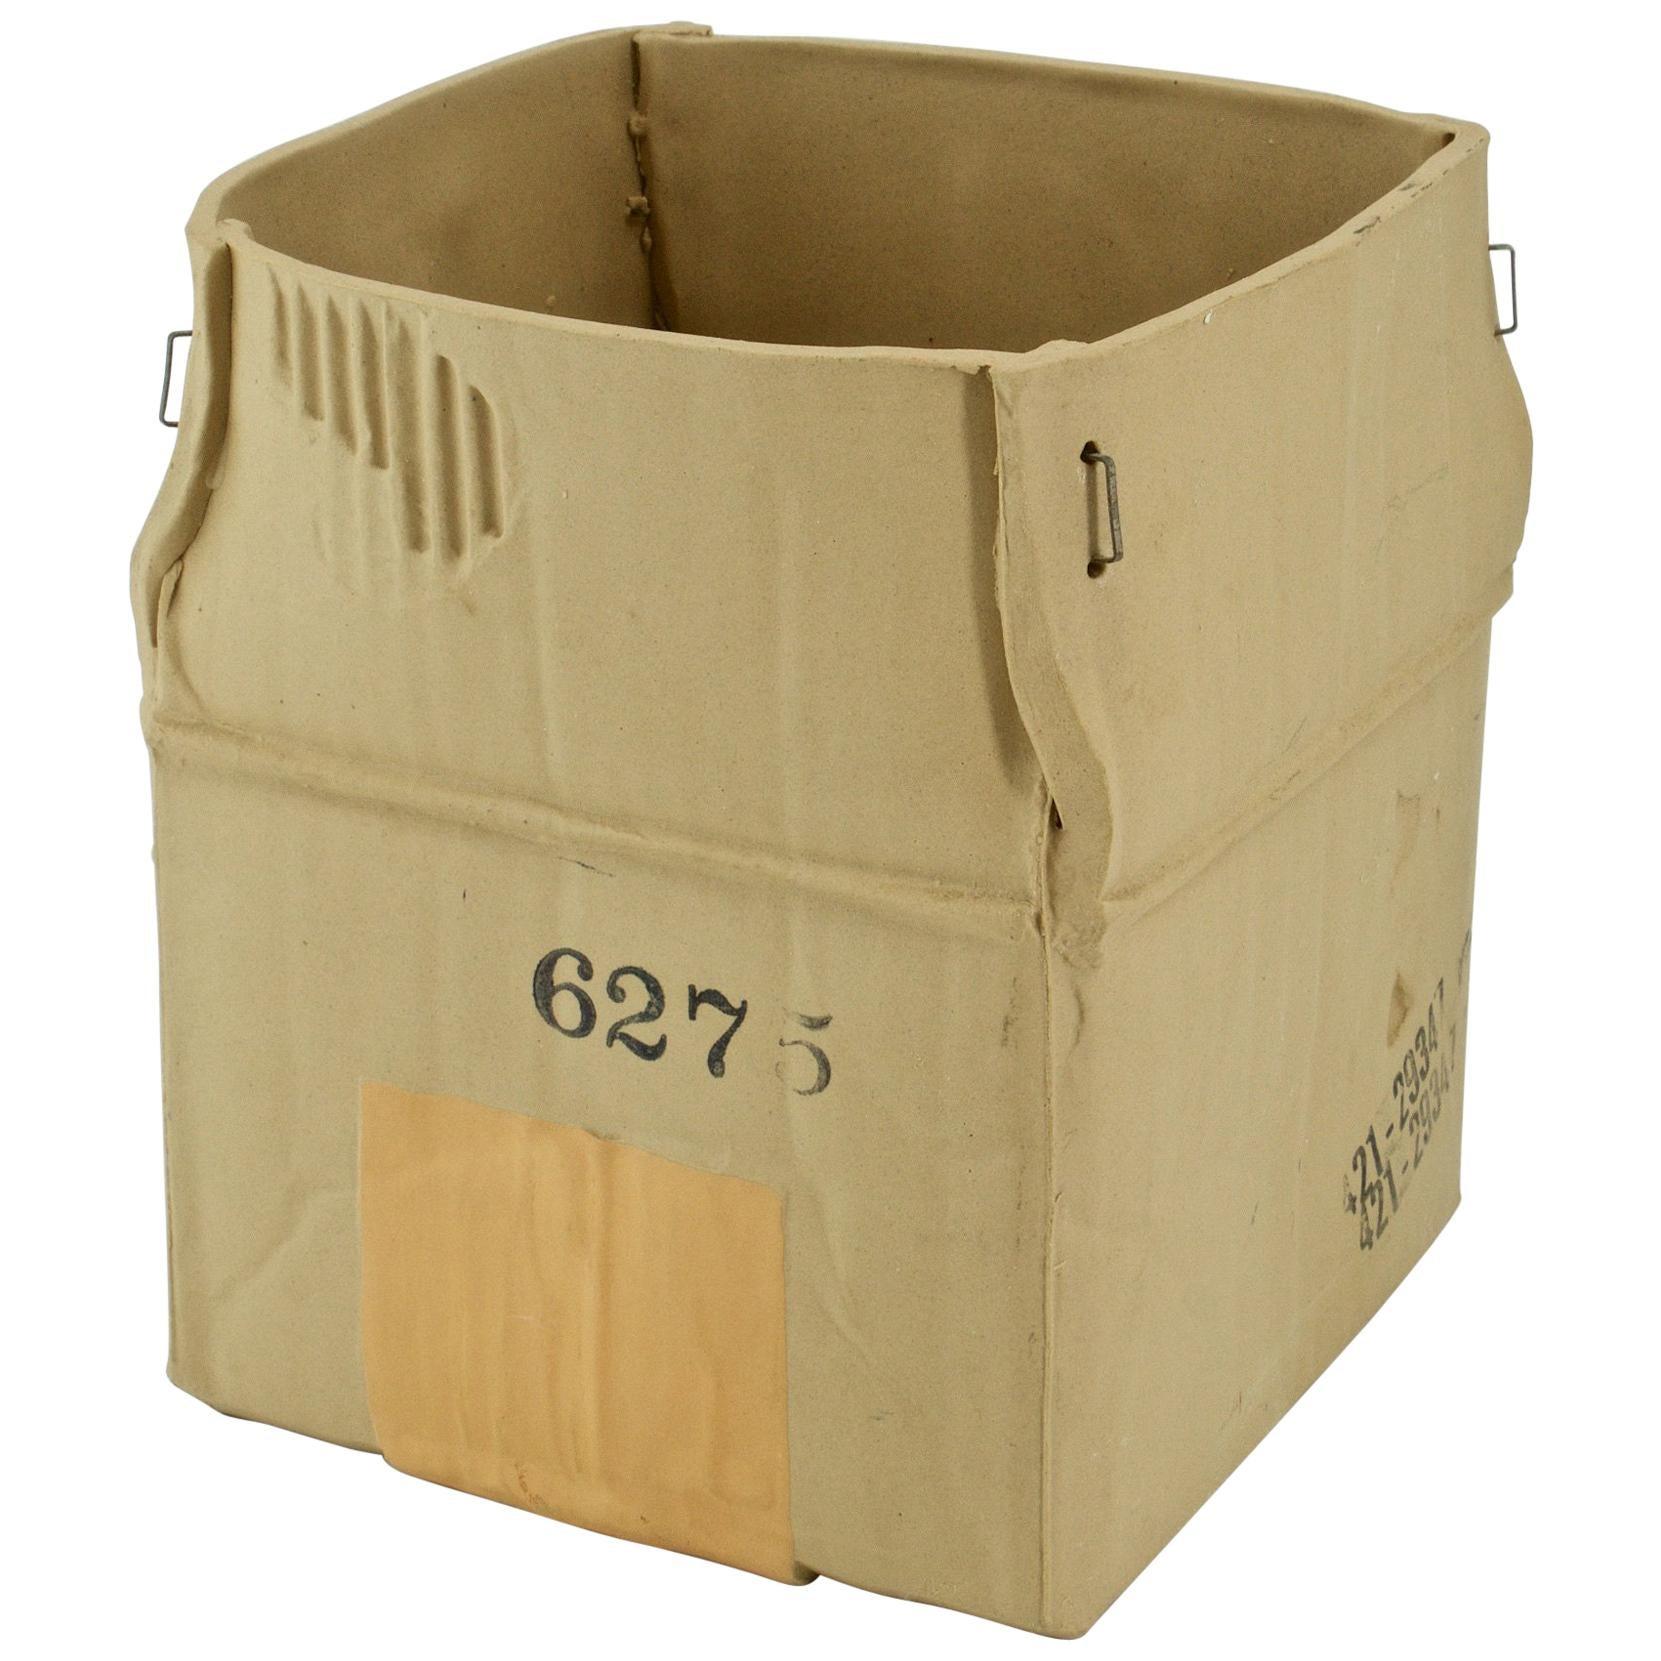 1970s Pop Art Ceramic Hypereal Sculpture Cardboard Box Flower Vase Warhol Era